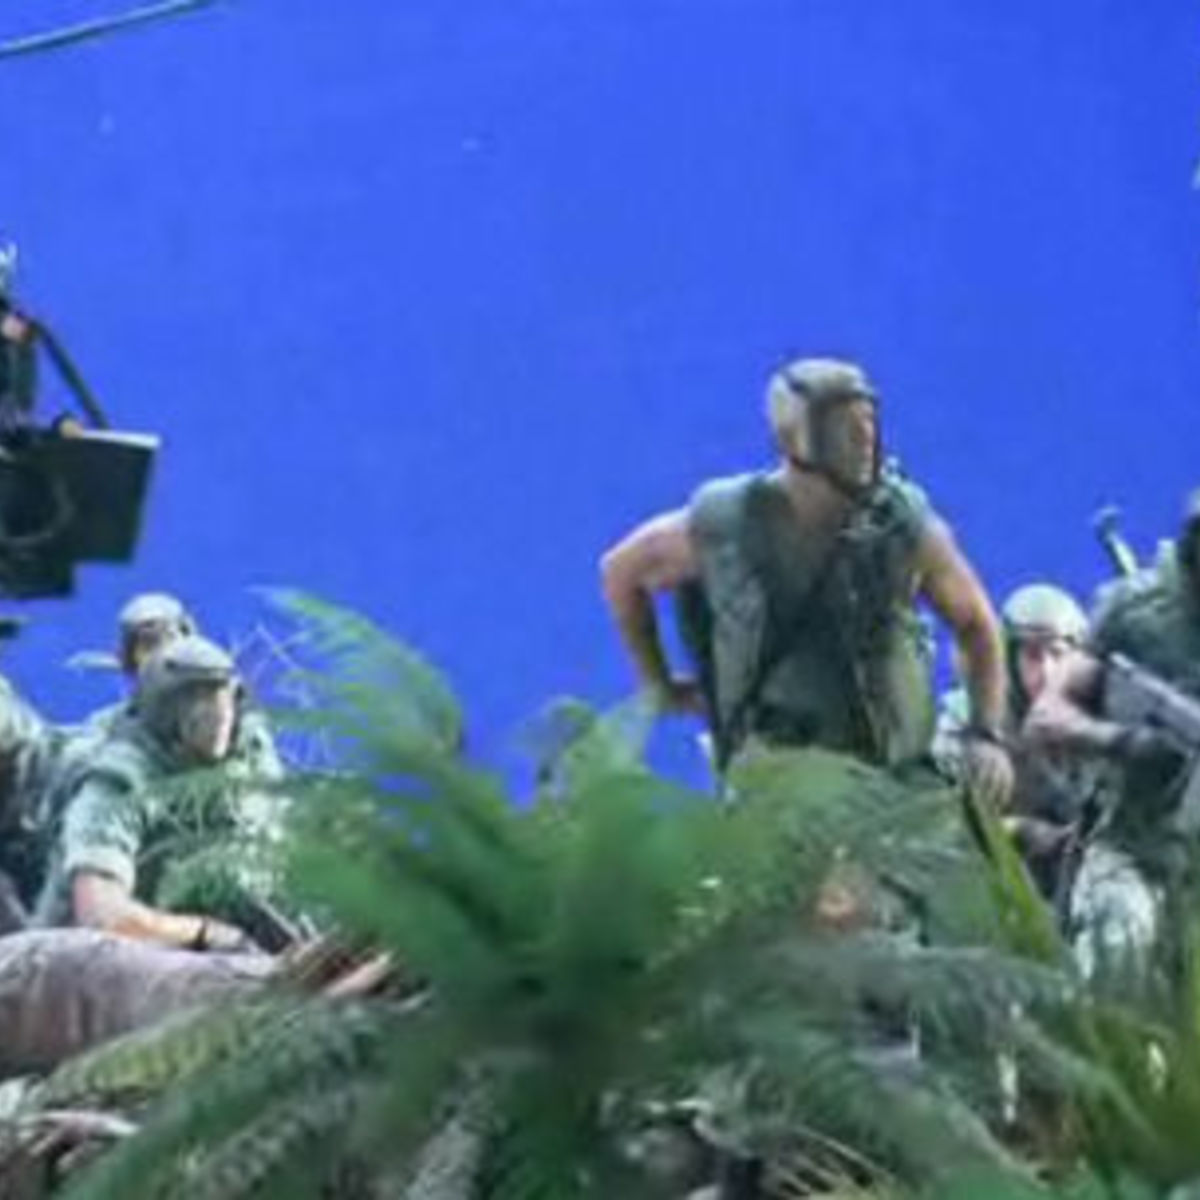 Avatar_Production_screencap.jpg